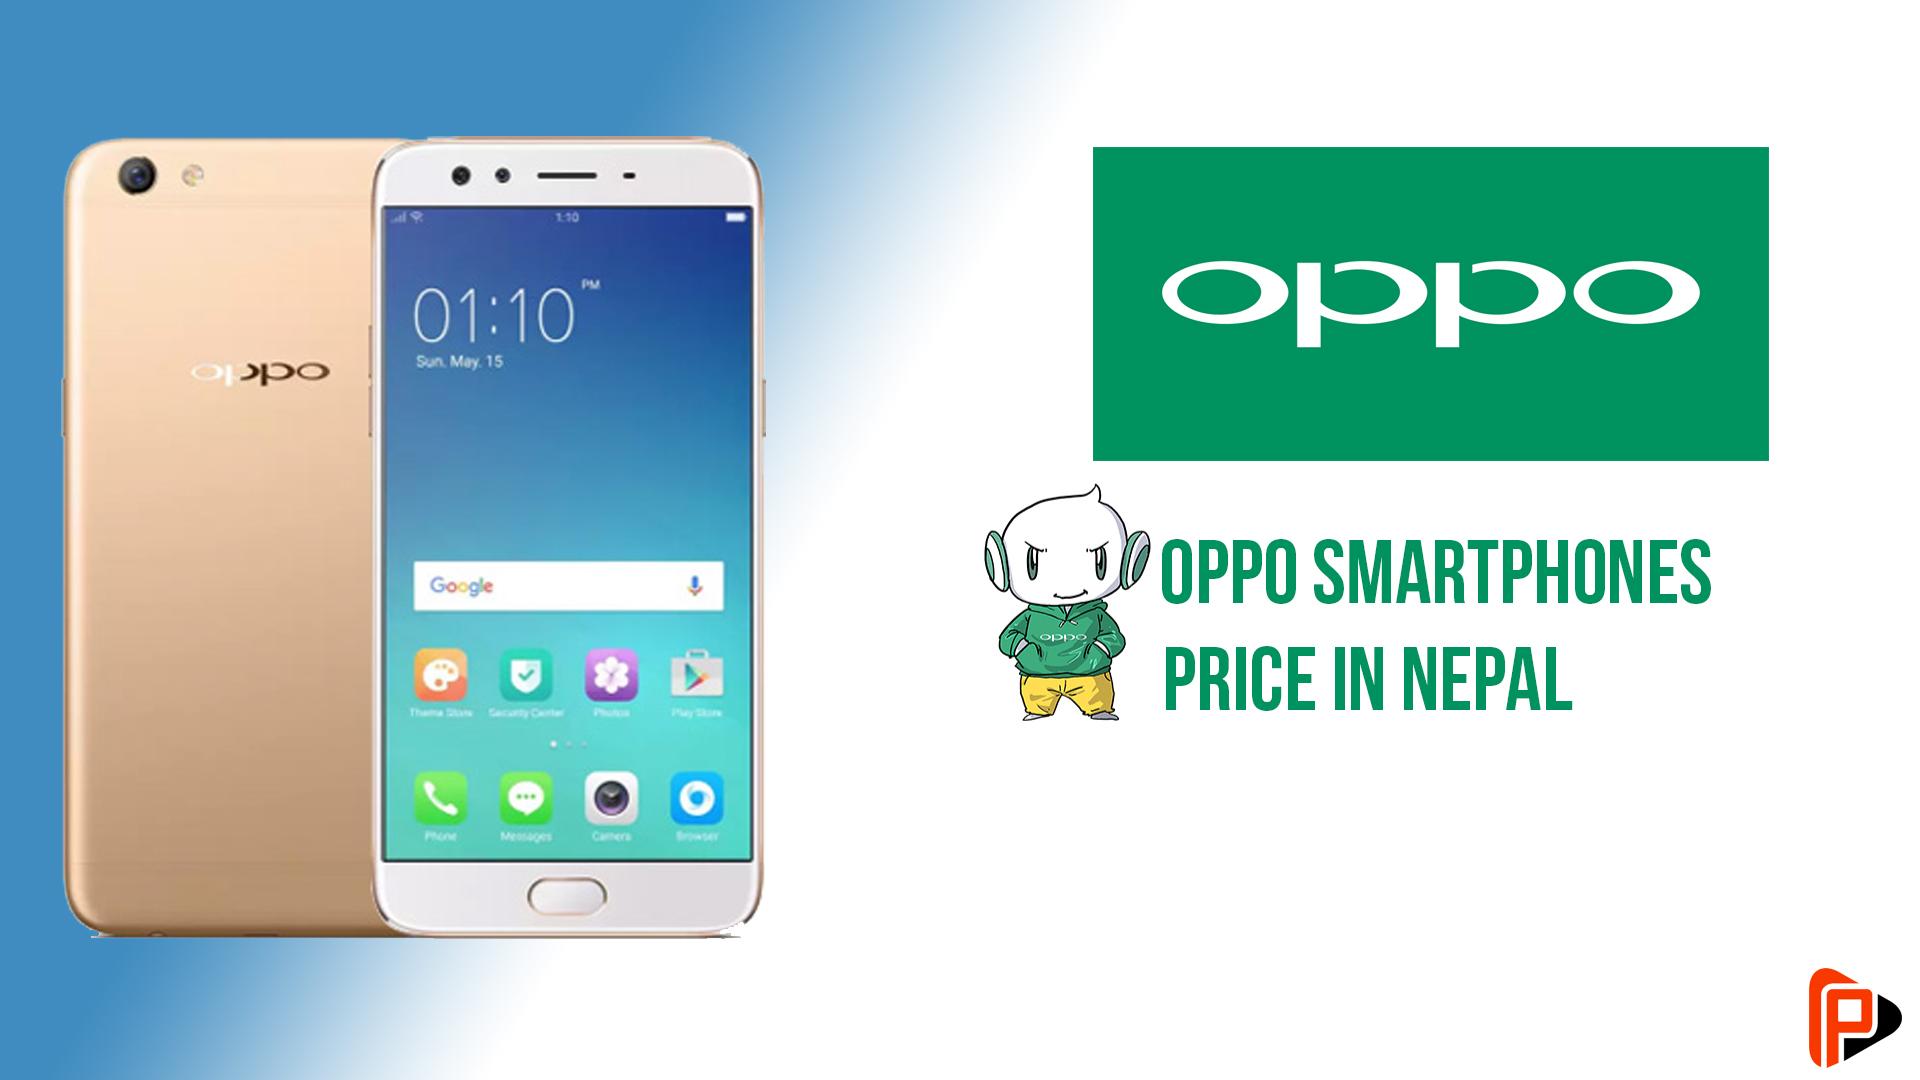 OPPO smartphones price in Nepal